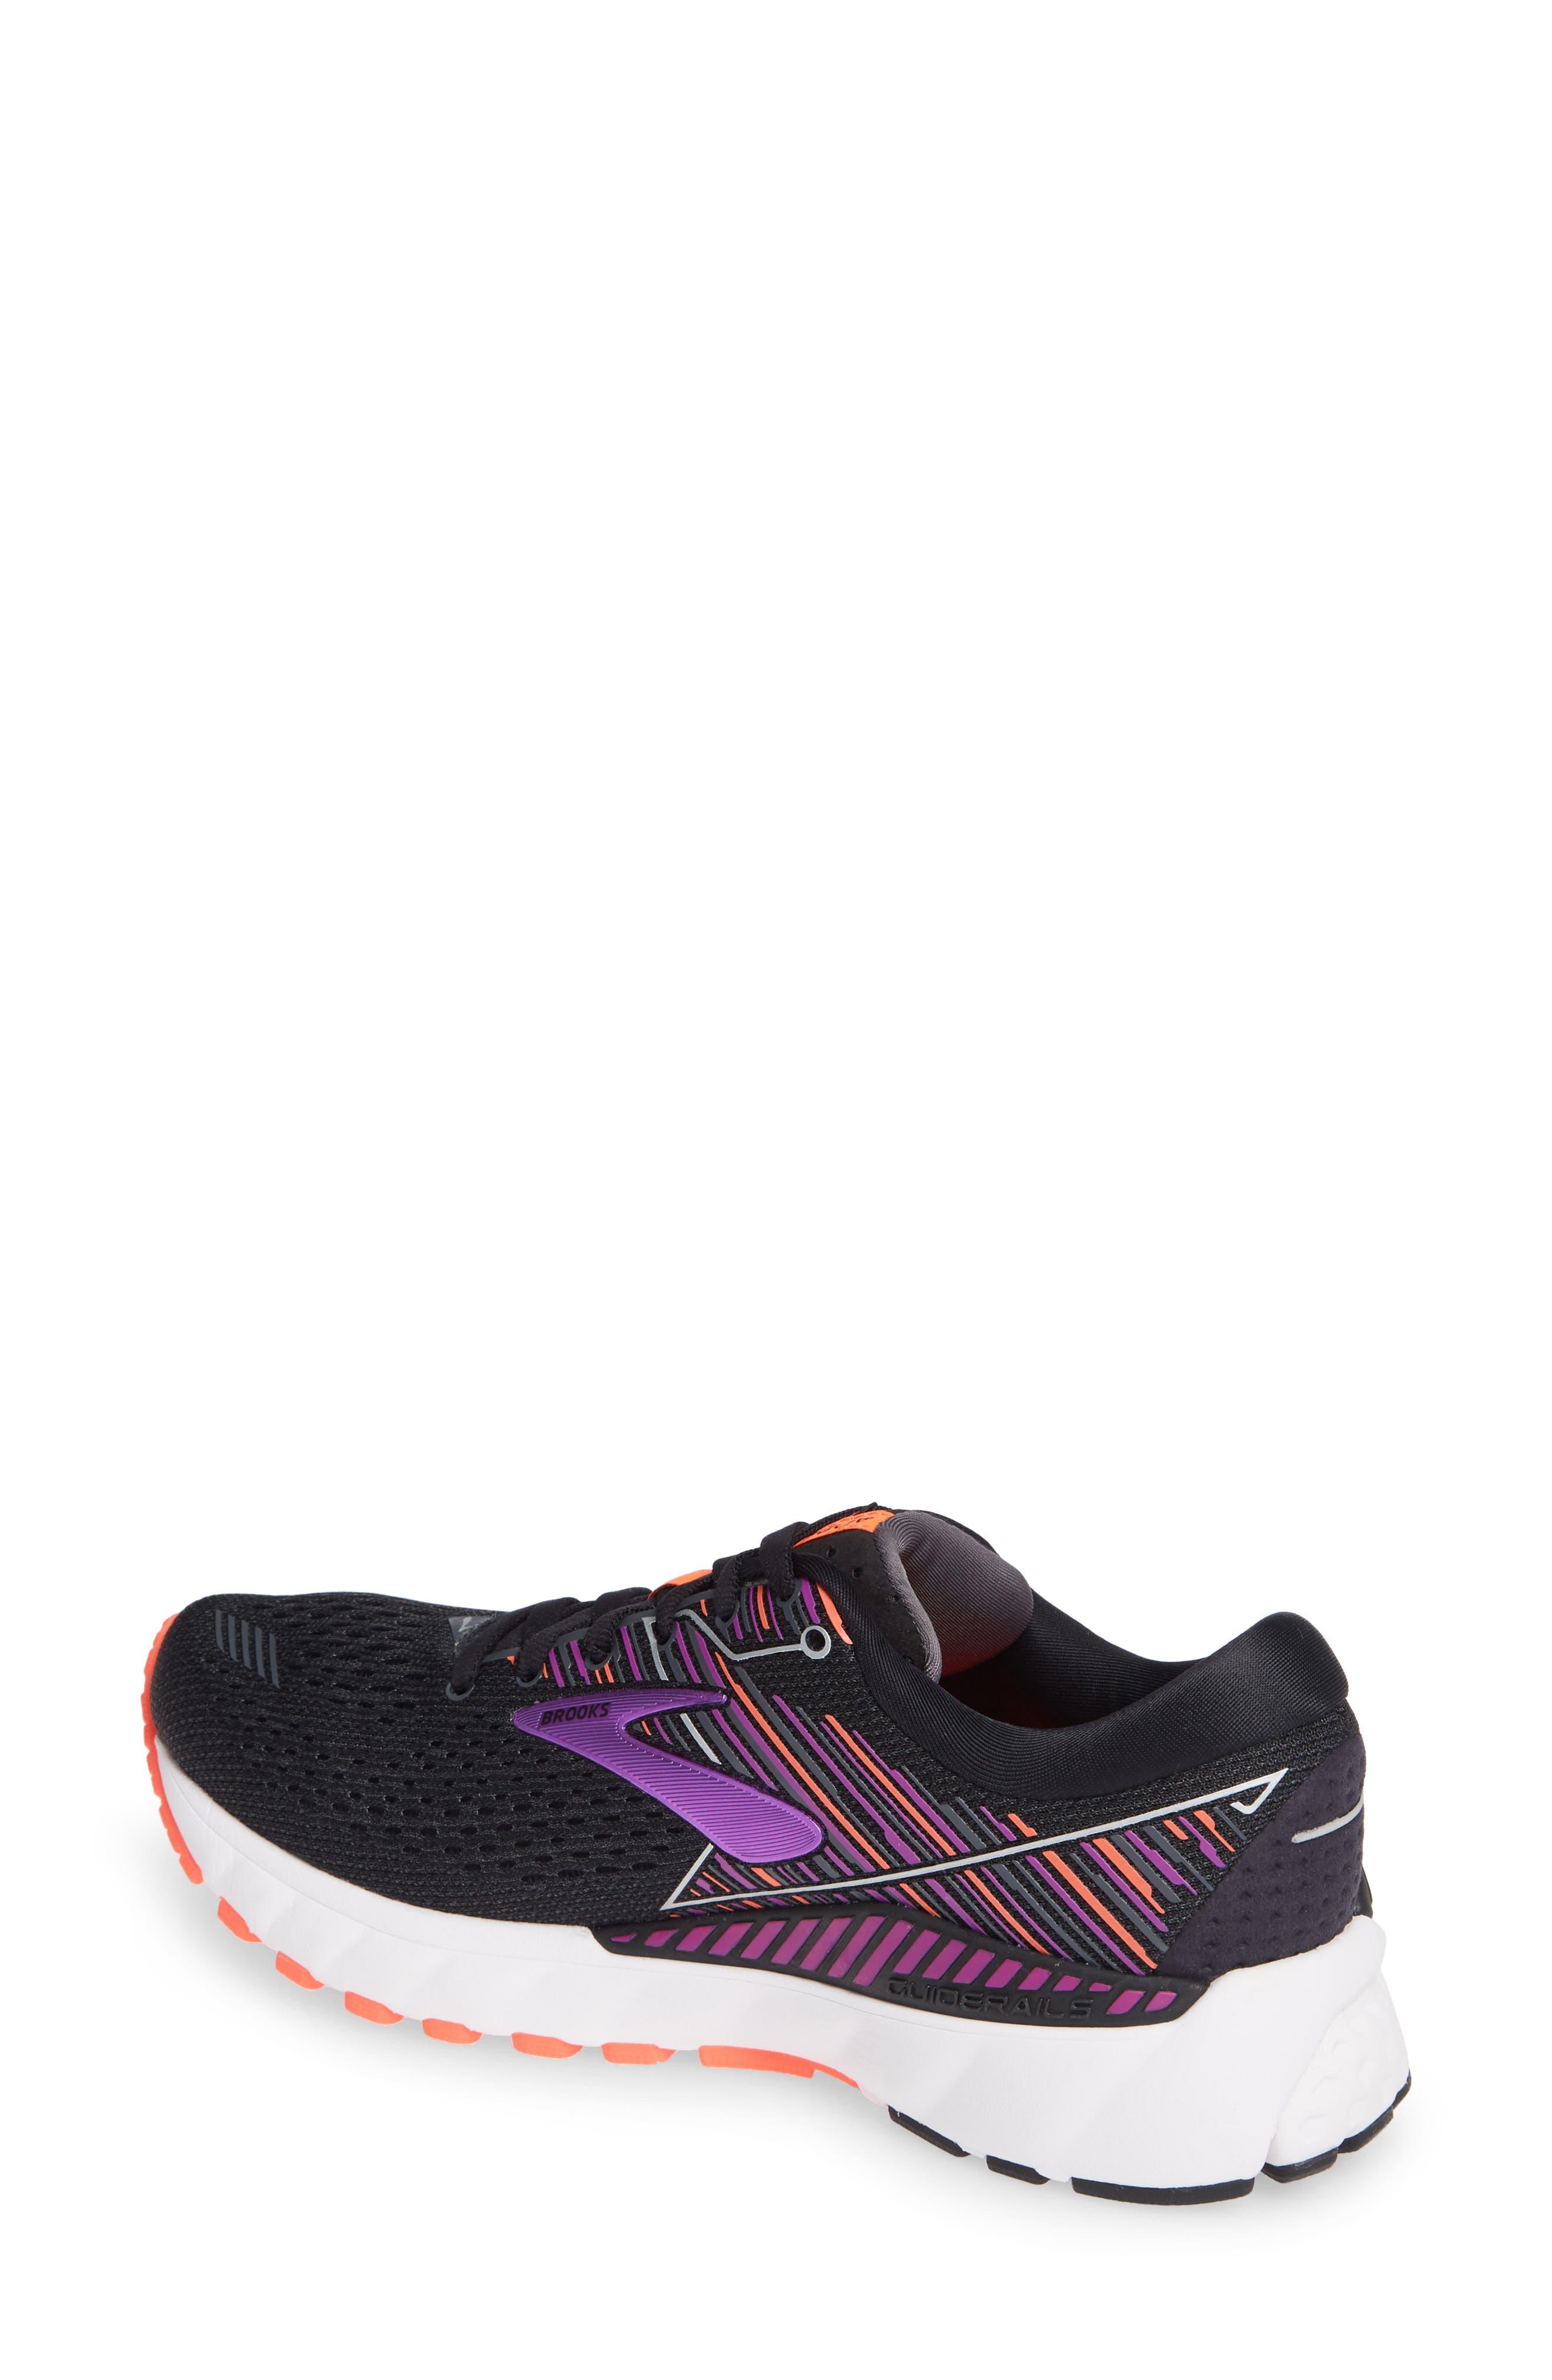 Adrenaline GTS 19 Running Shoe,                             Alternate thumbnail 2, color,                             BLACK/ PURPLE/ CORAL